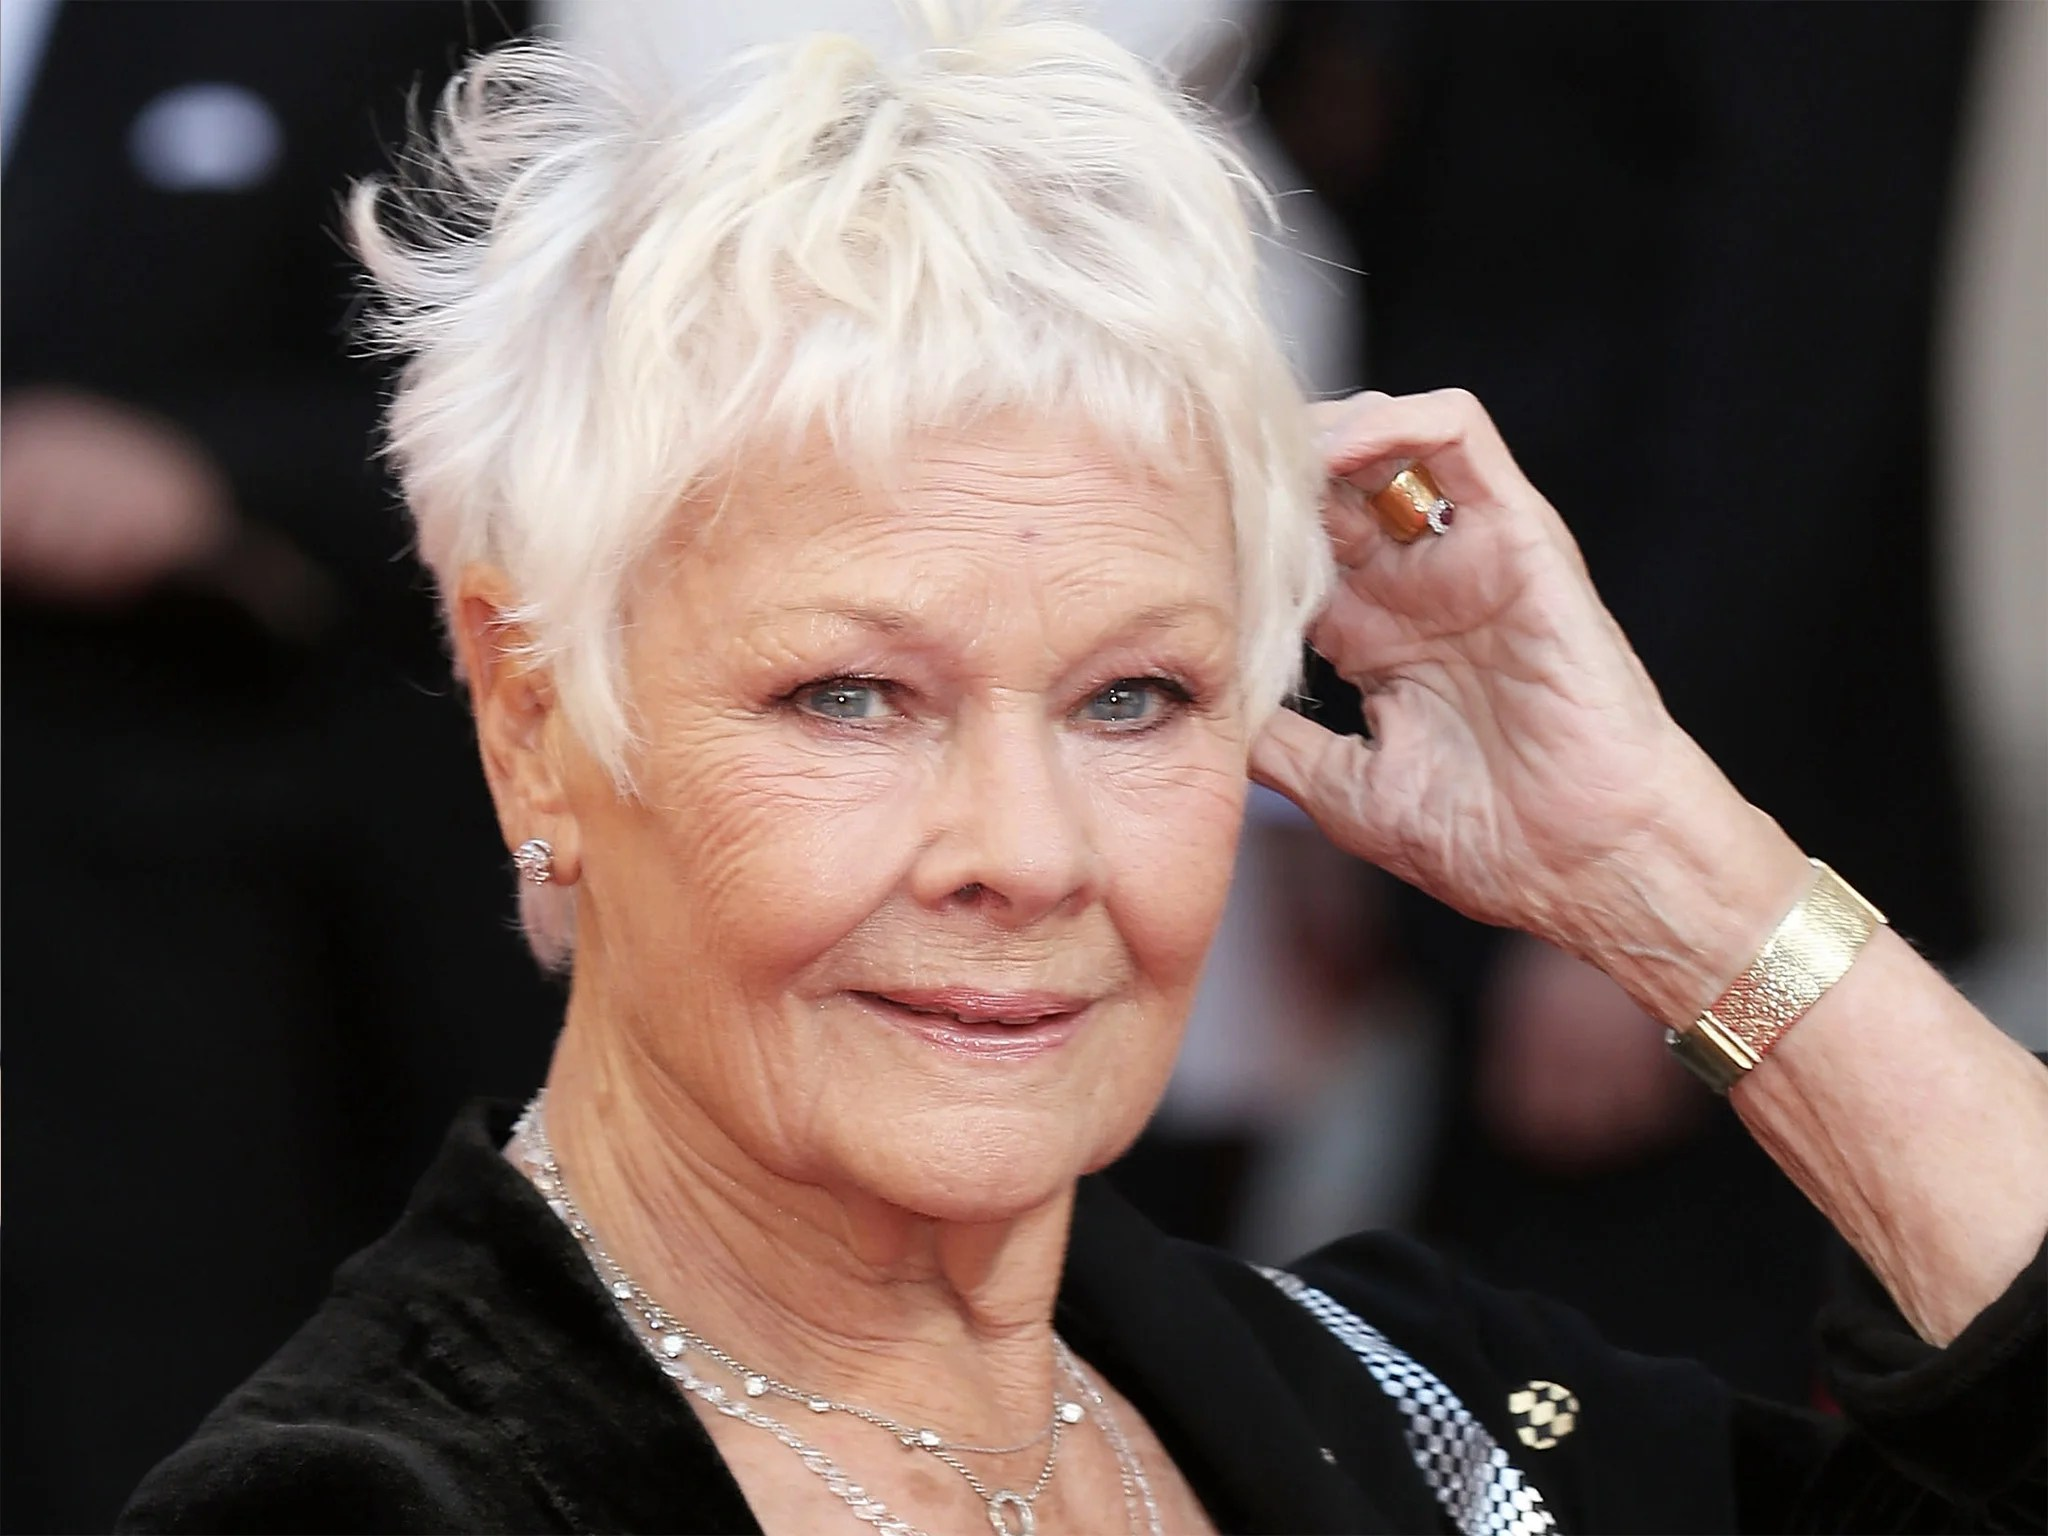 Dame Judi Dench Battles Failing Eyesight But Says Stop